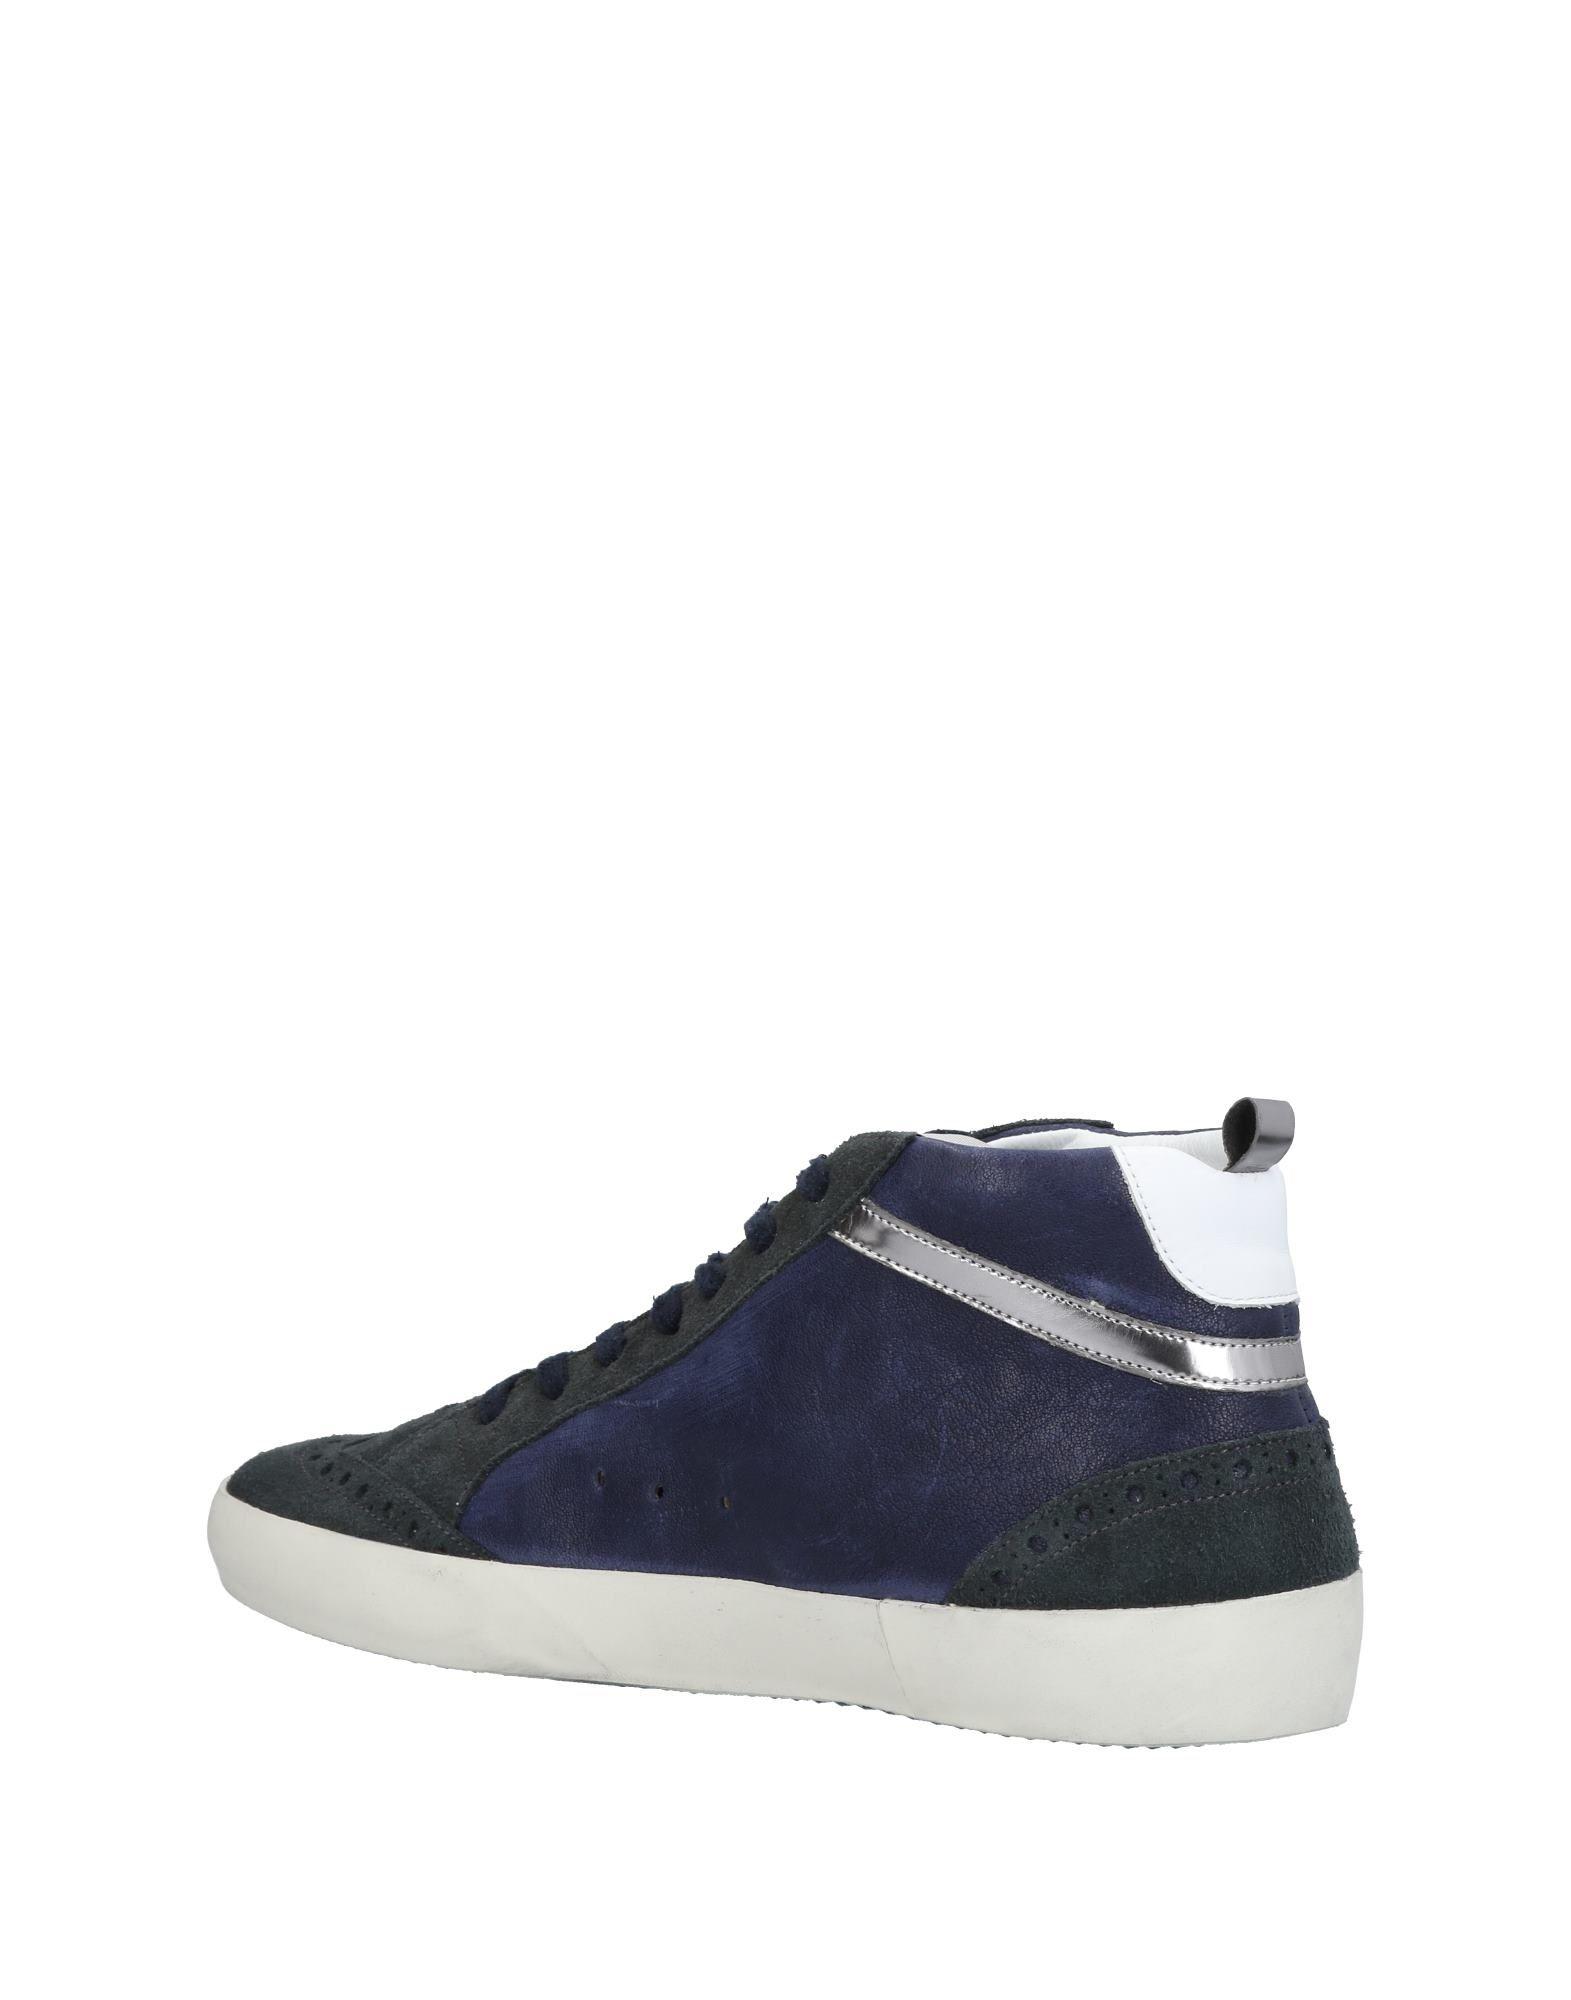 Quattrobarradodici Sneakers Sneakers Quattrobarradodici Herren  11457077EG 09312d